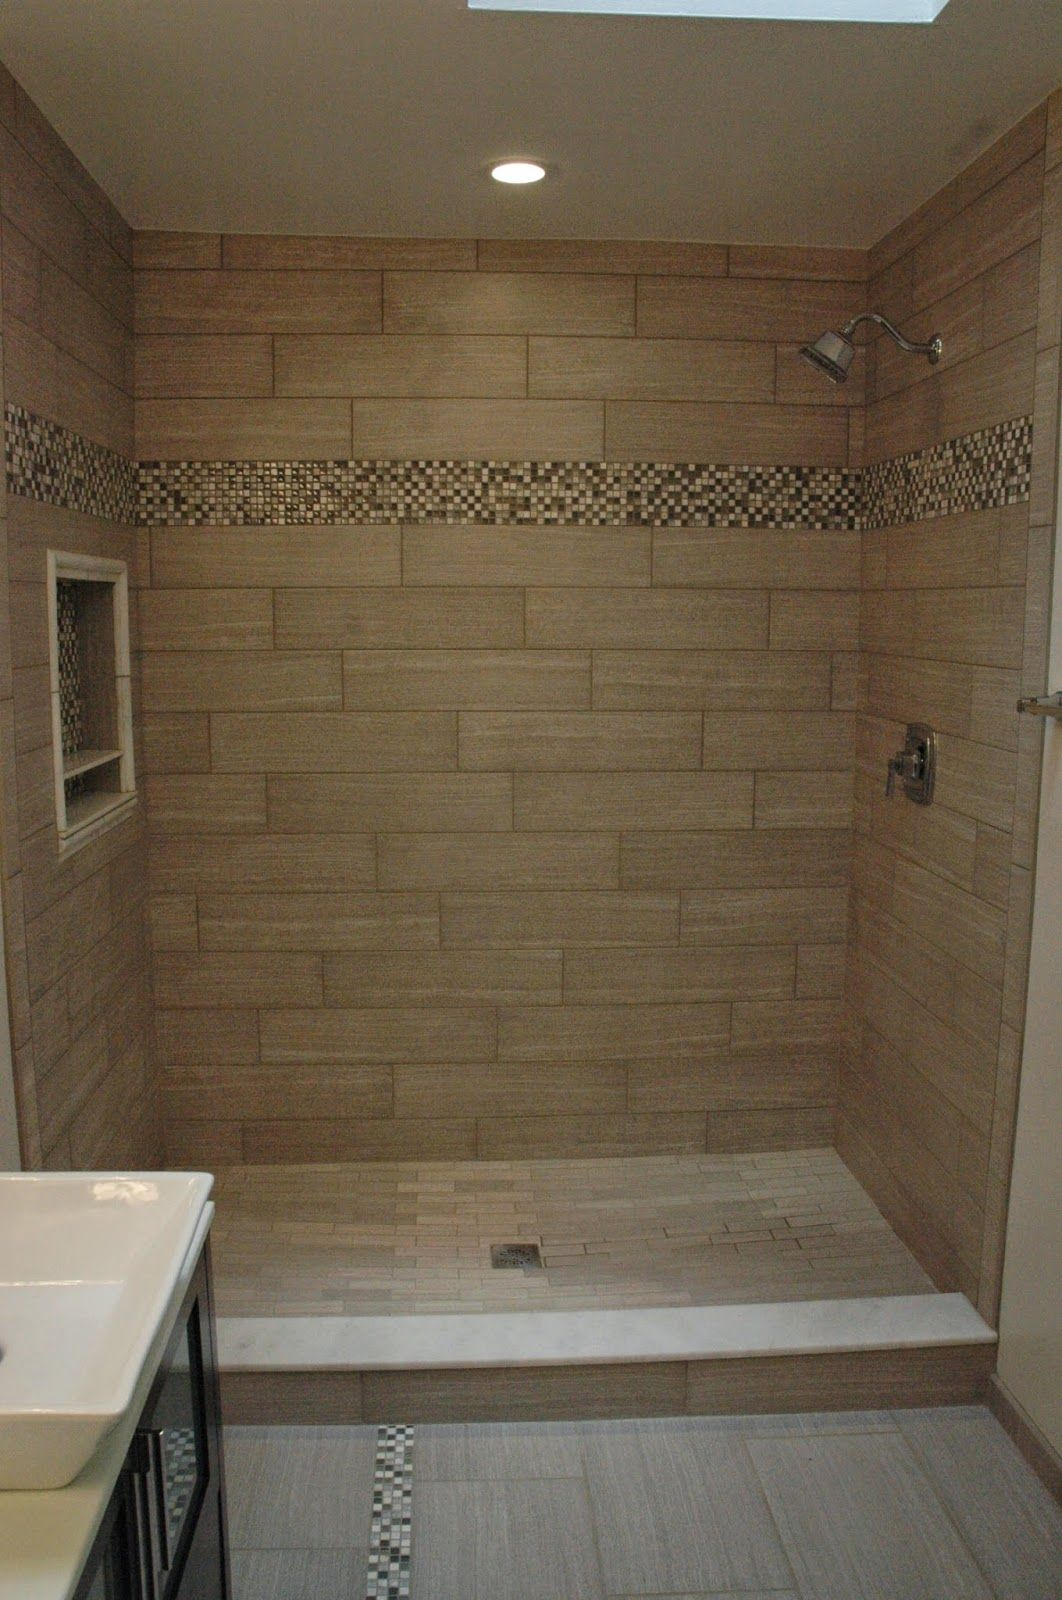 Charmant Custom Tile Showers, Bathroom Design, Renovations U0026 Flooring: Modern  Bathrom Remodel